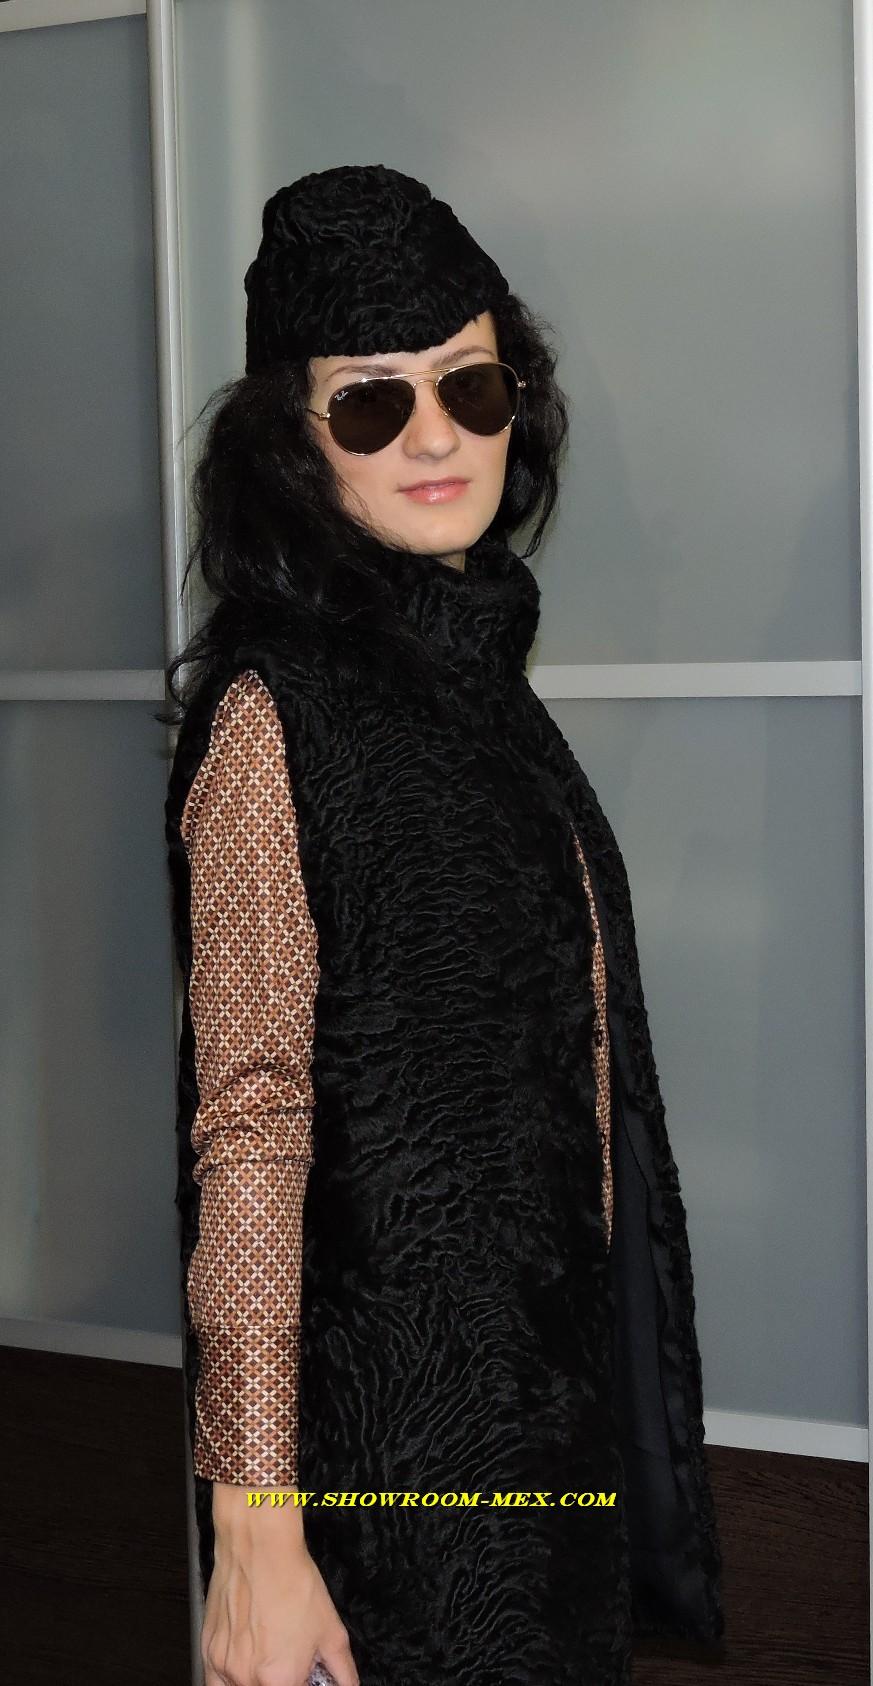 Жилет с  шапкой из свакары swakara coat lux hat  www.showroom-mex.com 01.jpg